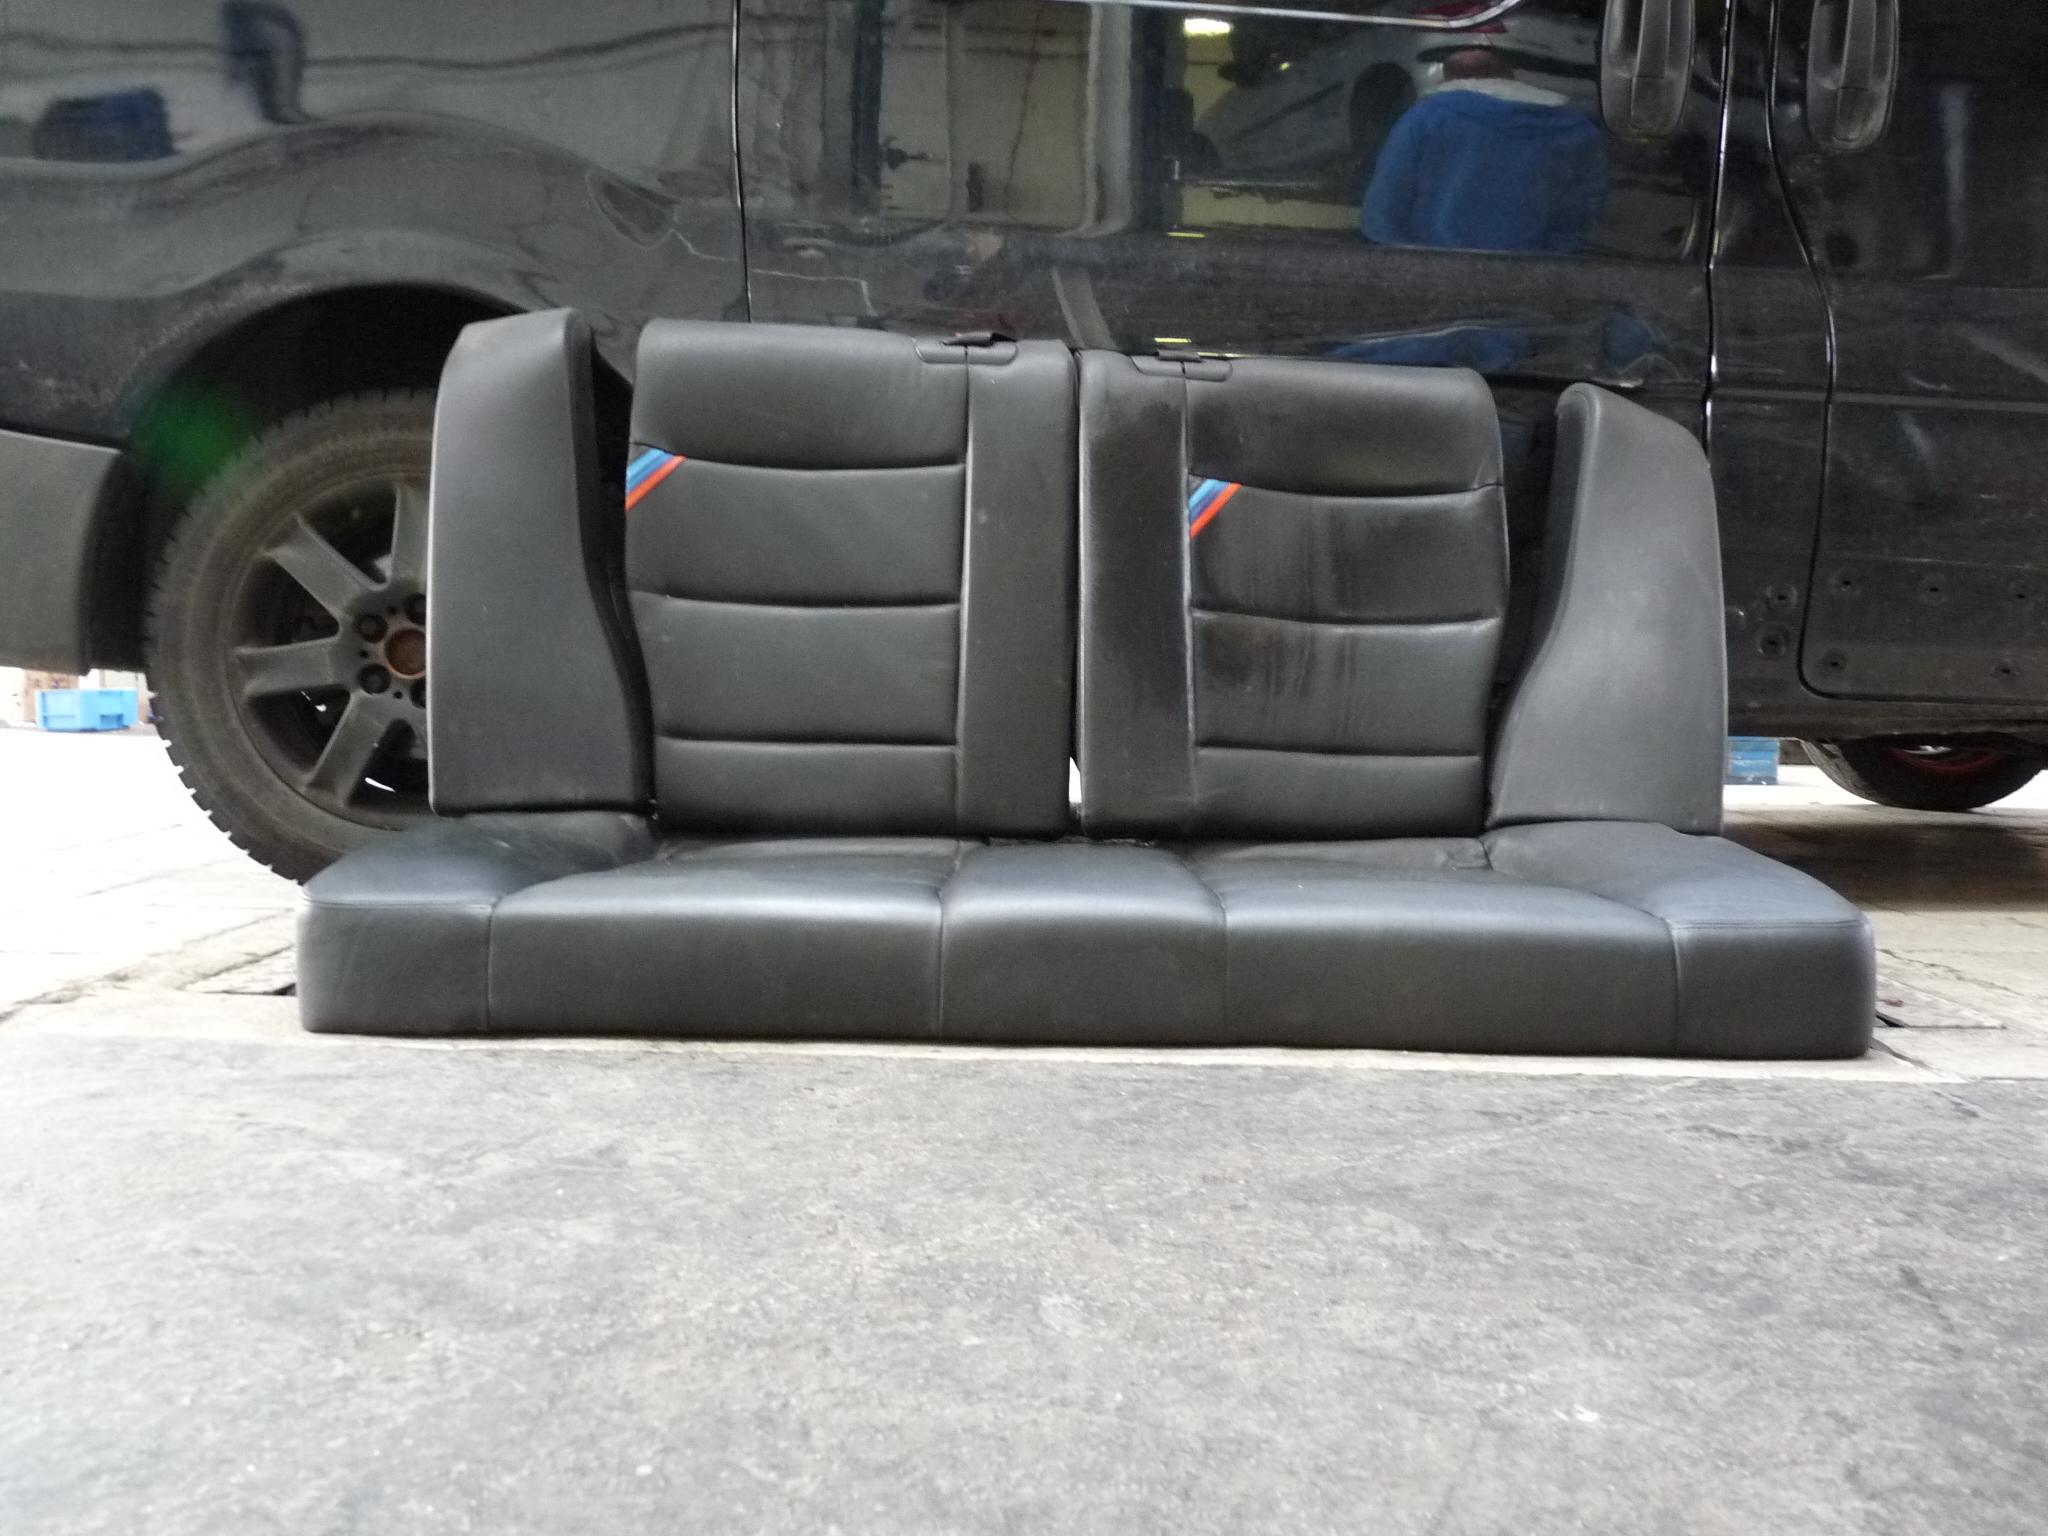 Www Speedworxs De Bmw M3 E36 Coupe Leather Interior Seats Walknappa Black Seatheating Sportseats